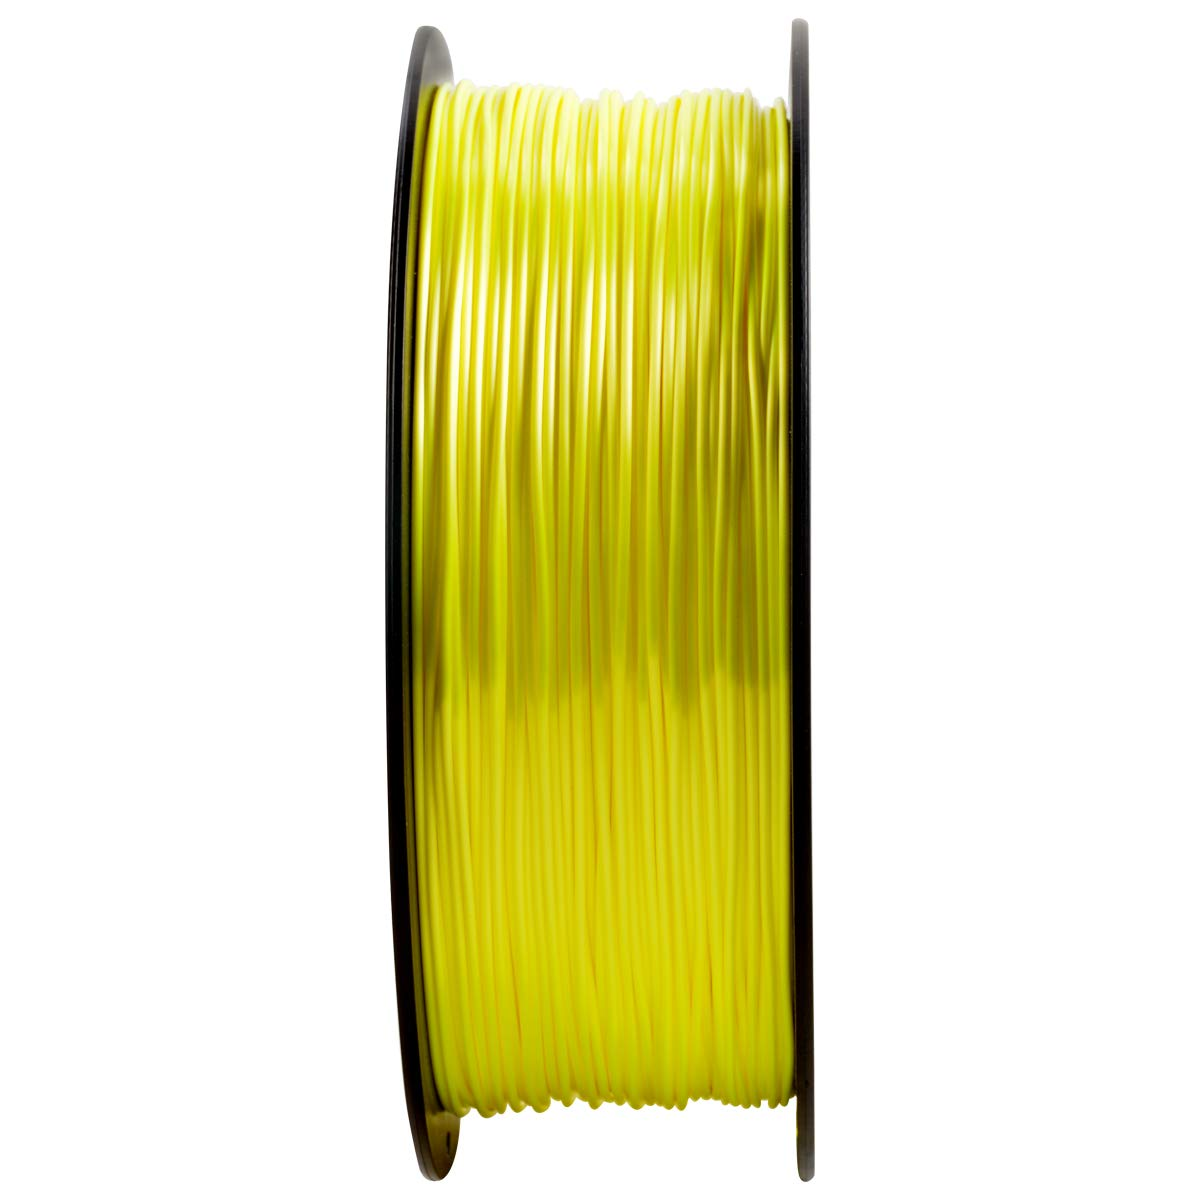 PLA Filament 1.75mm Geeetech 3D Printer Shine PLA Filament,1kg per Spool,Silk Gold Silk Style Filament